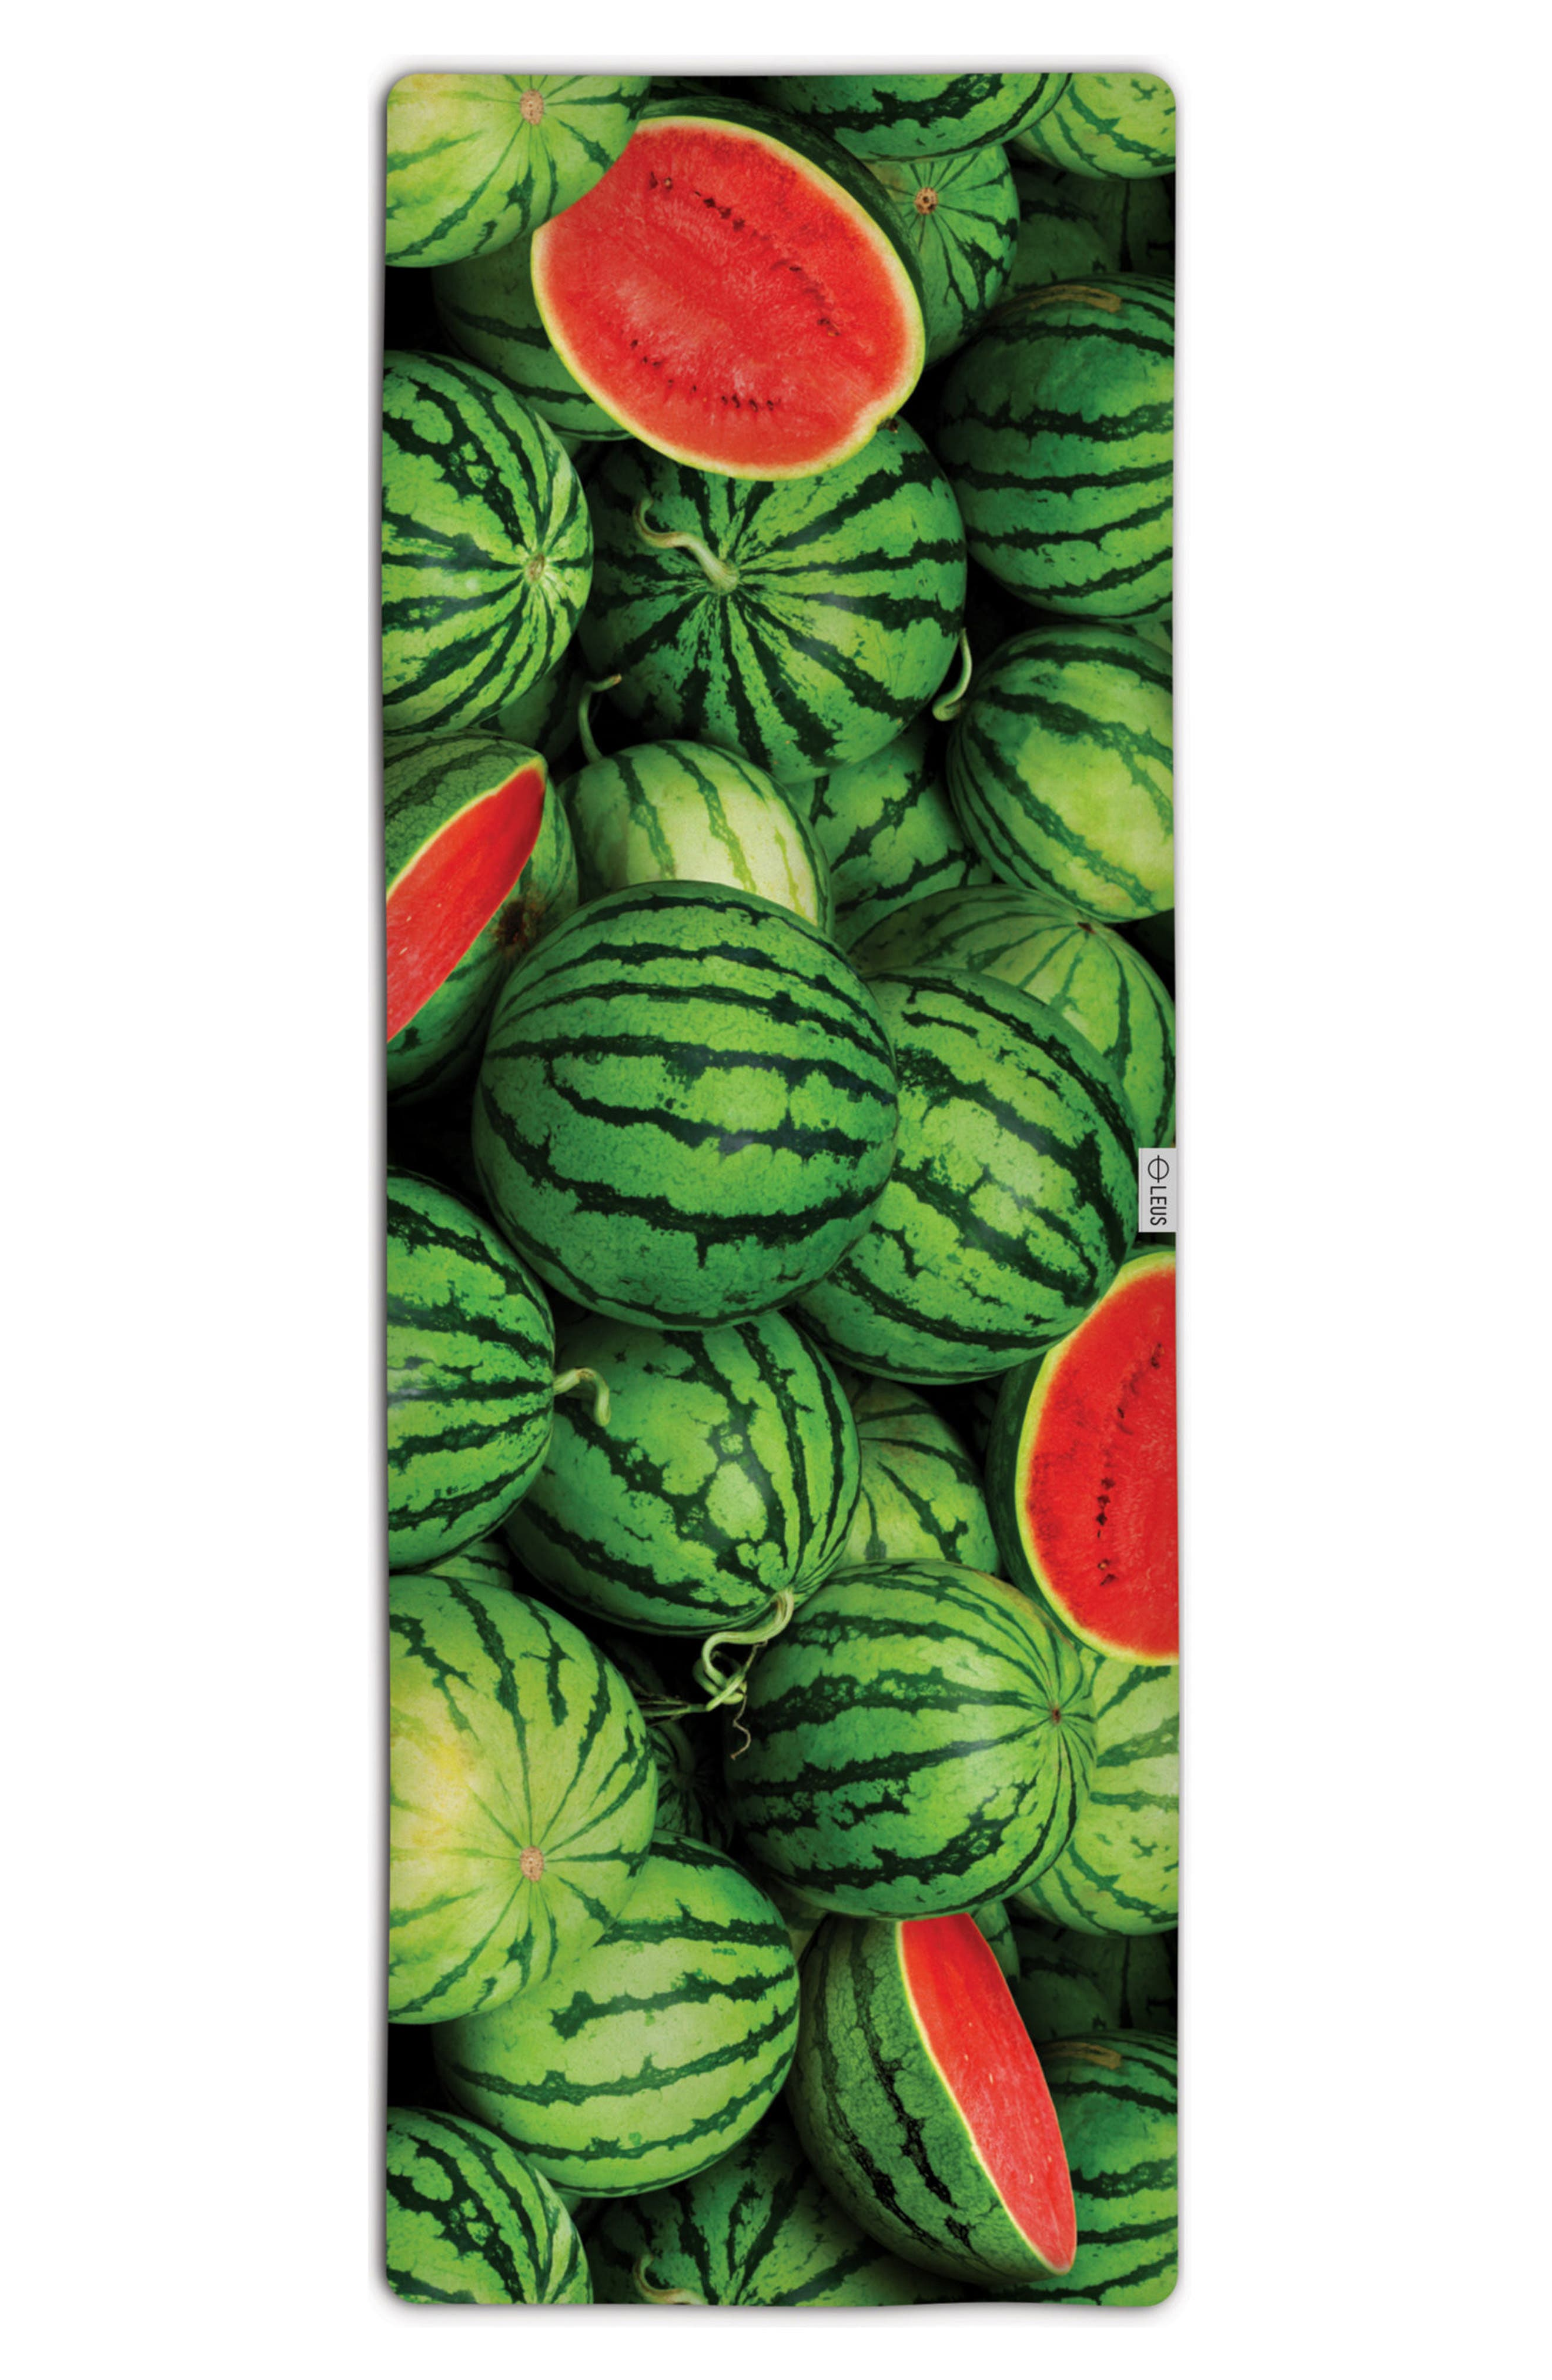 Watermelon Yoga Mat Towel,                             Main thumbnail 1, color,                             300